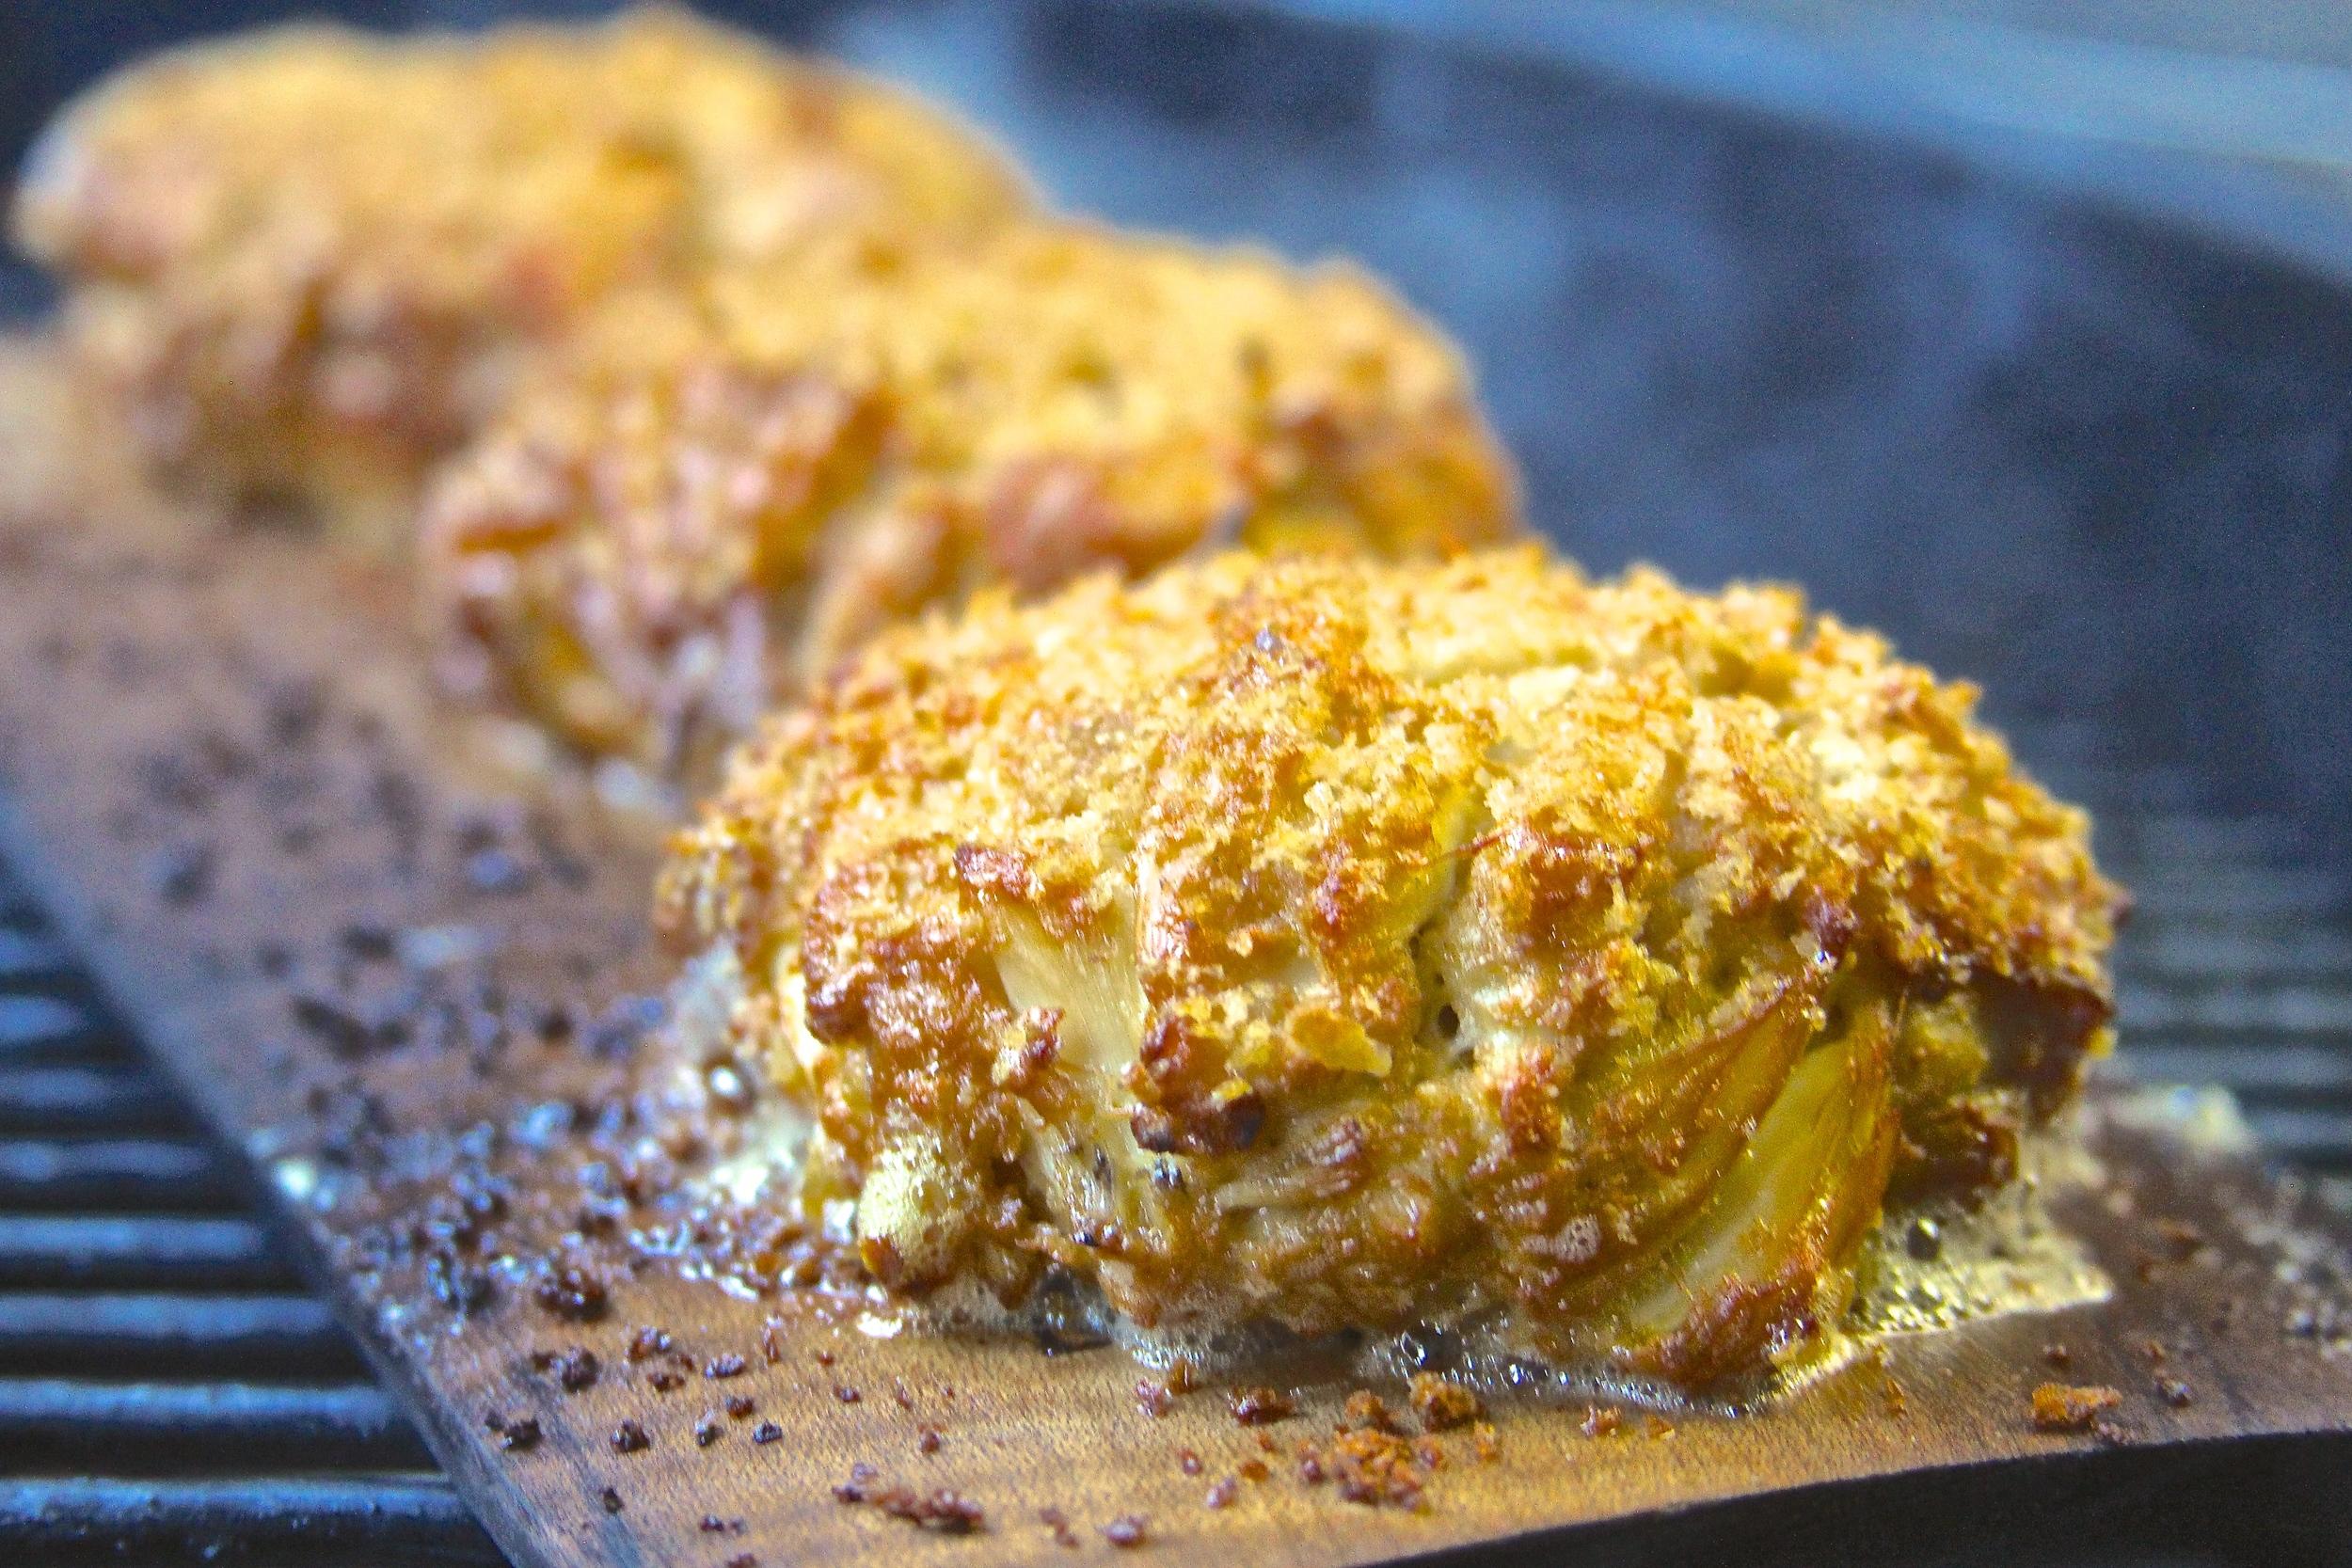 Plank Grilled Crab Cakes with Lemon-Garlic Aioli